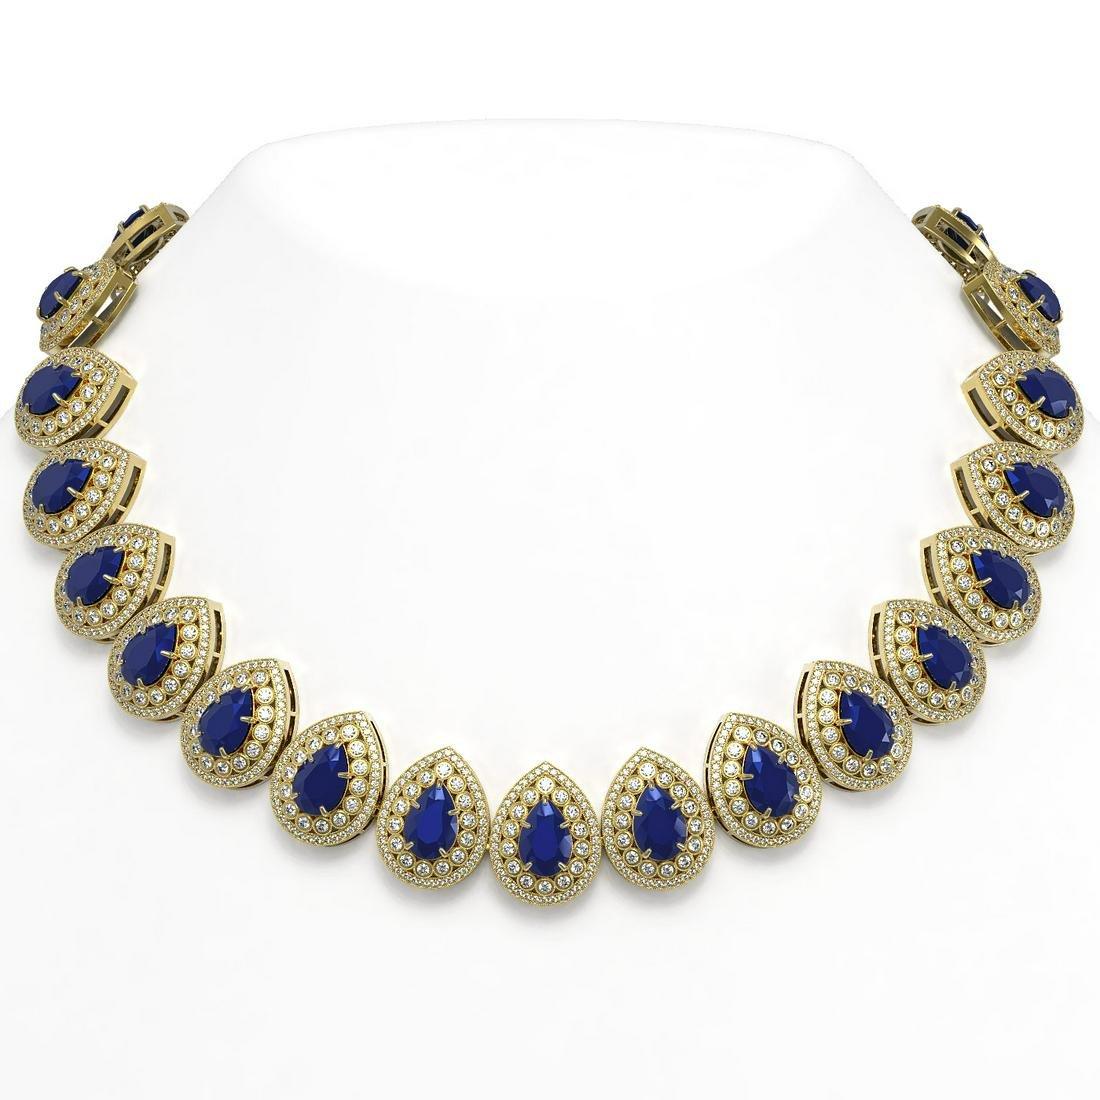 121.42 ctw Sapphire & Diamond Necklace 14K Yellow Gold